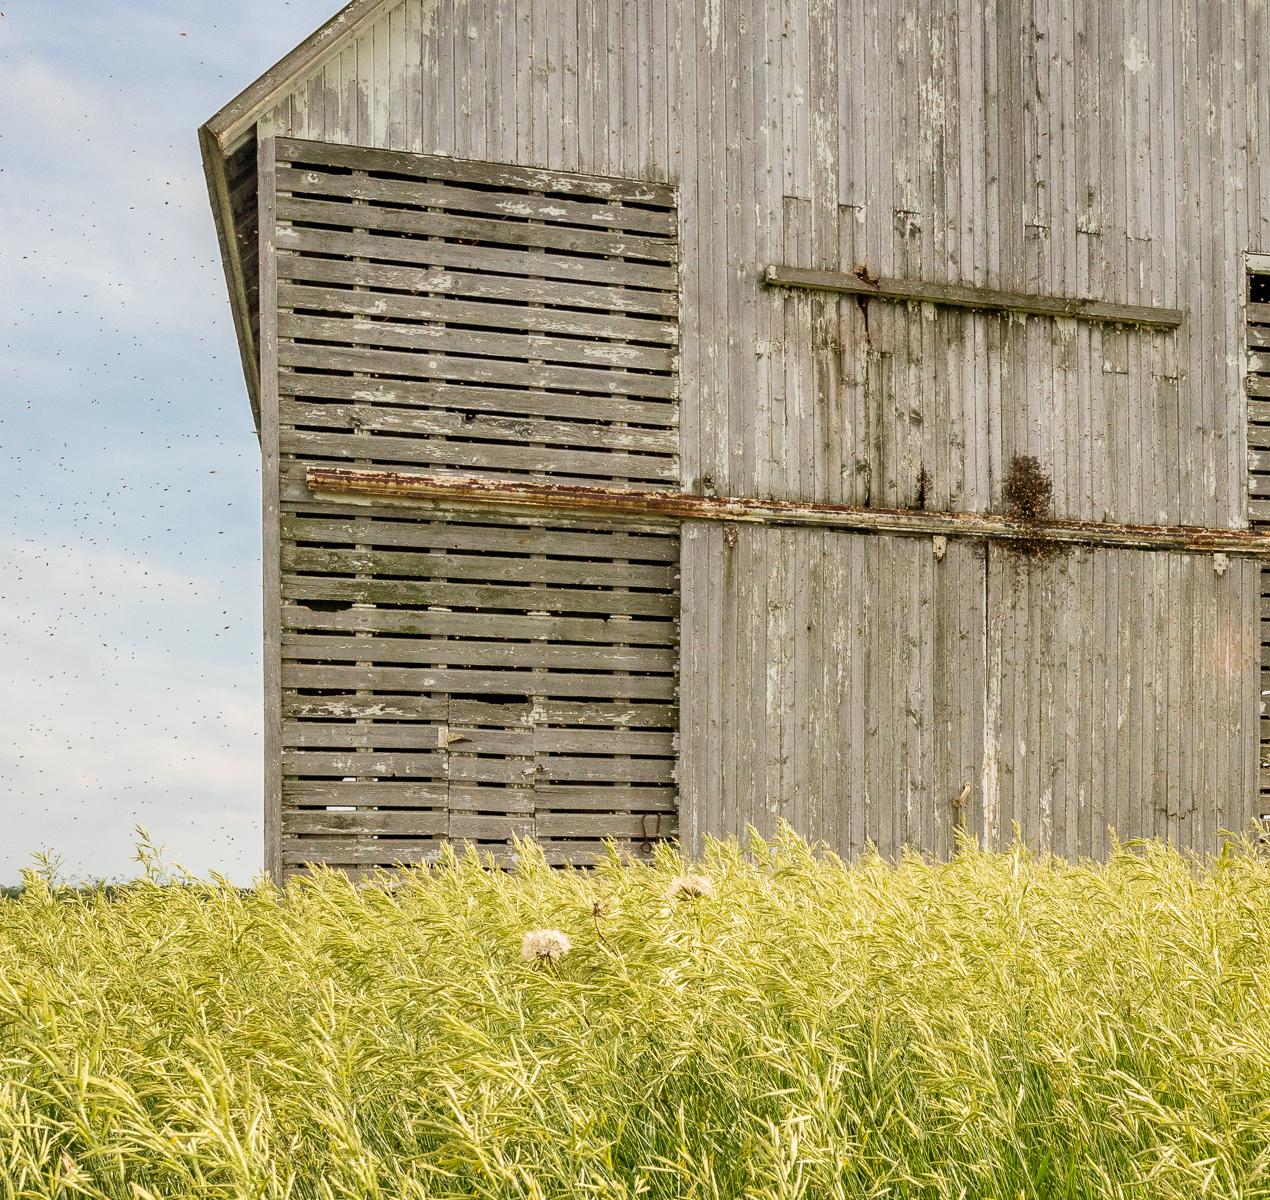 Corn crib and bees, Stark County, Illinois